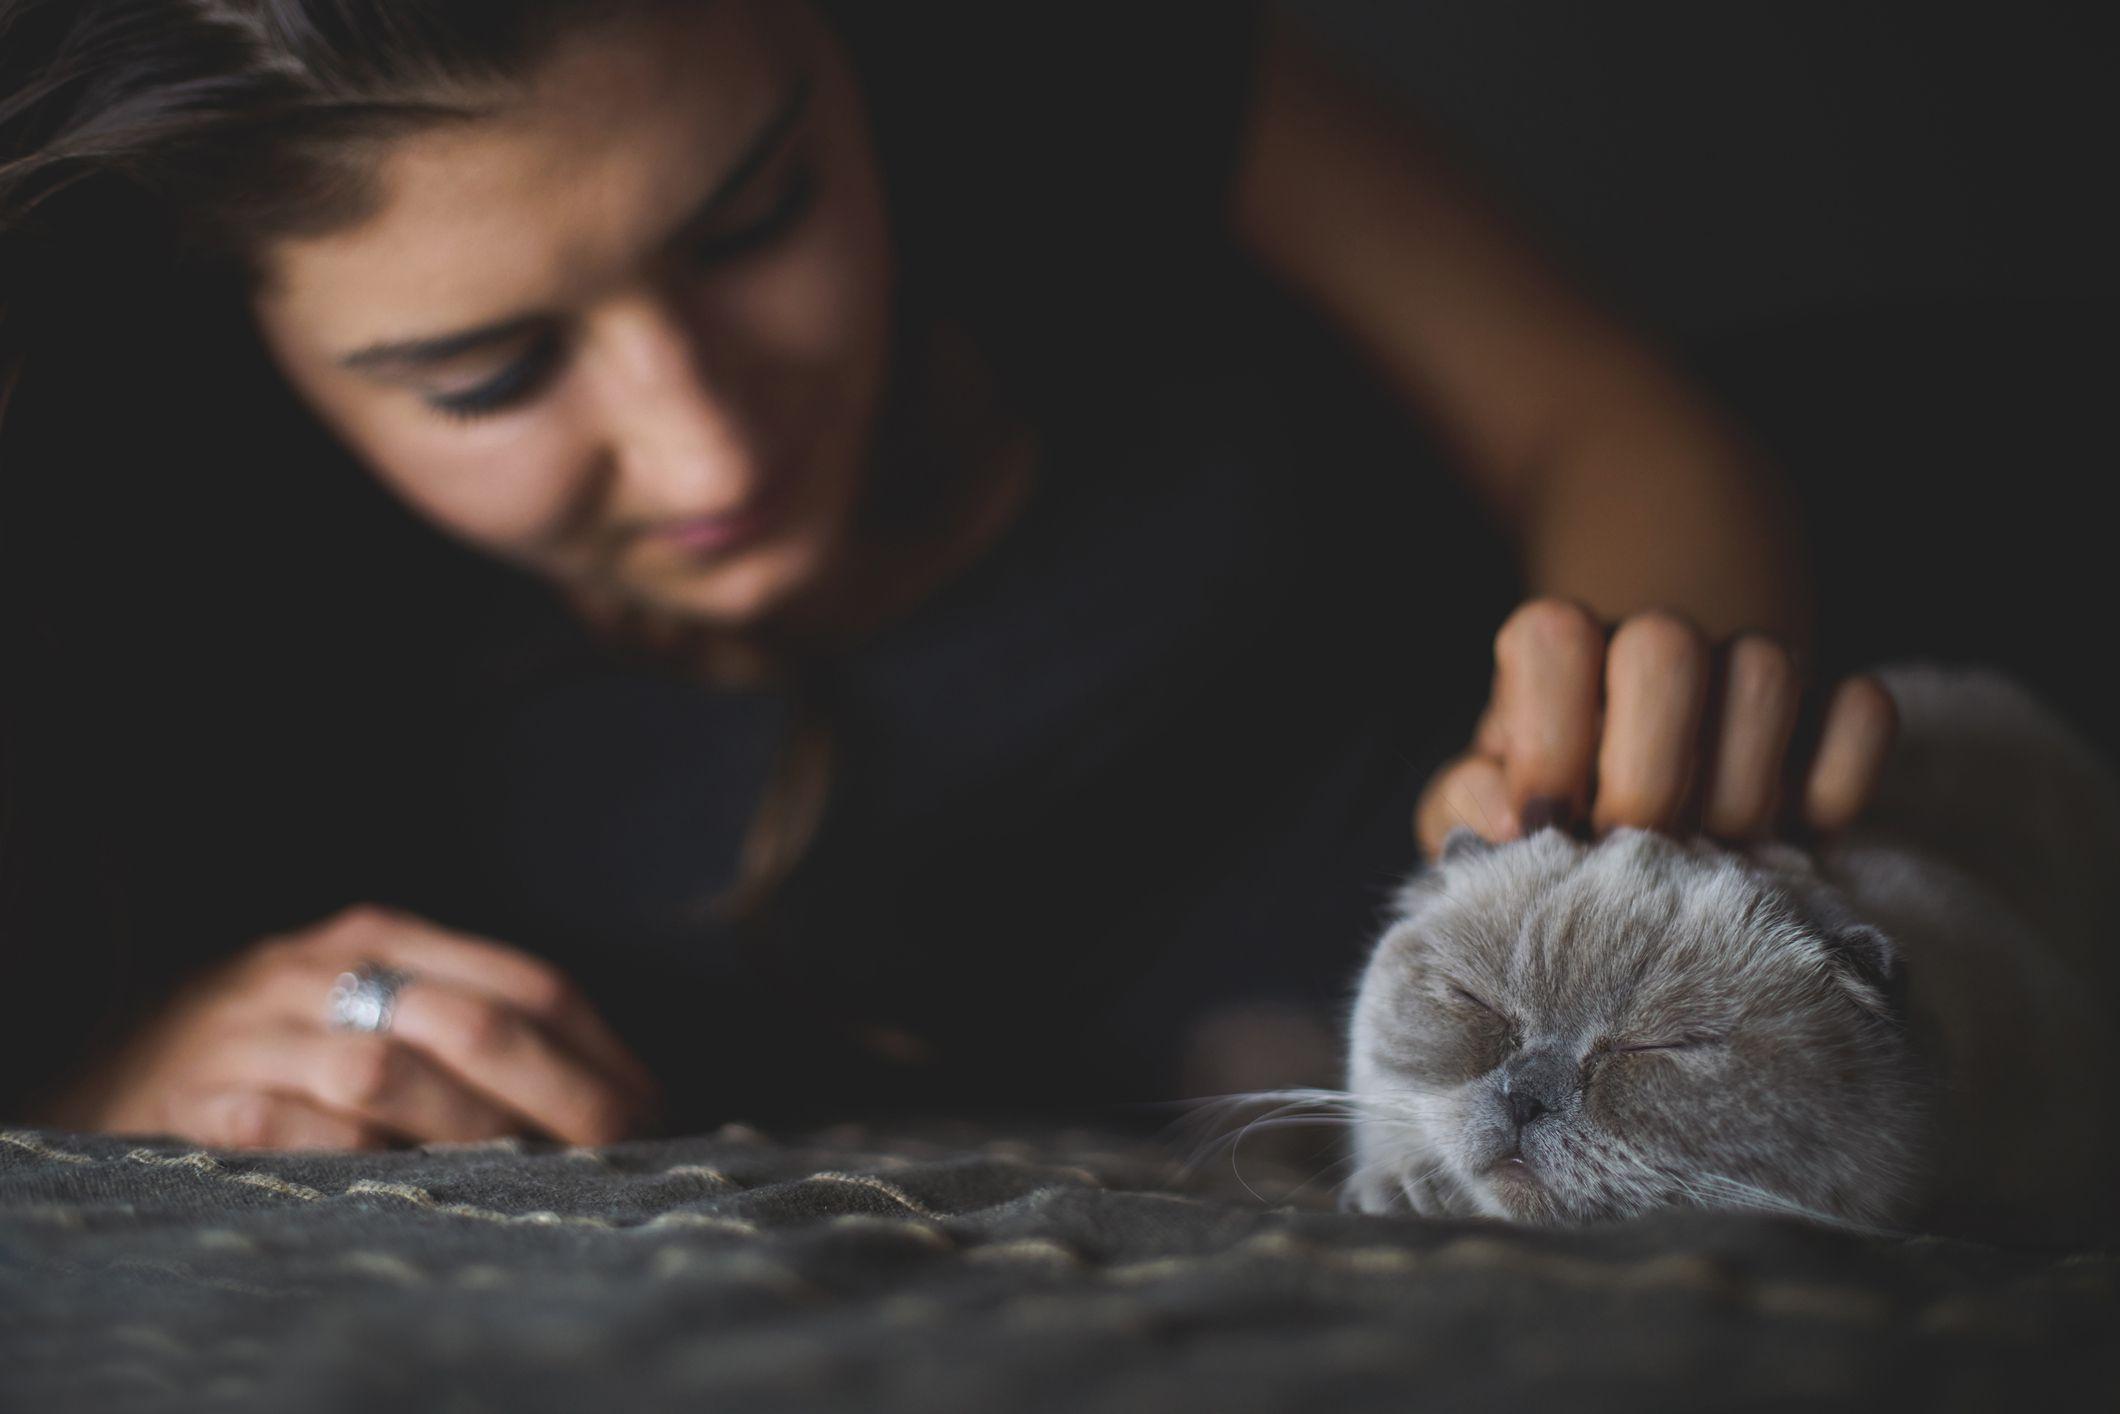 Sleeping Scottish Fold kitten being petted